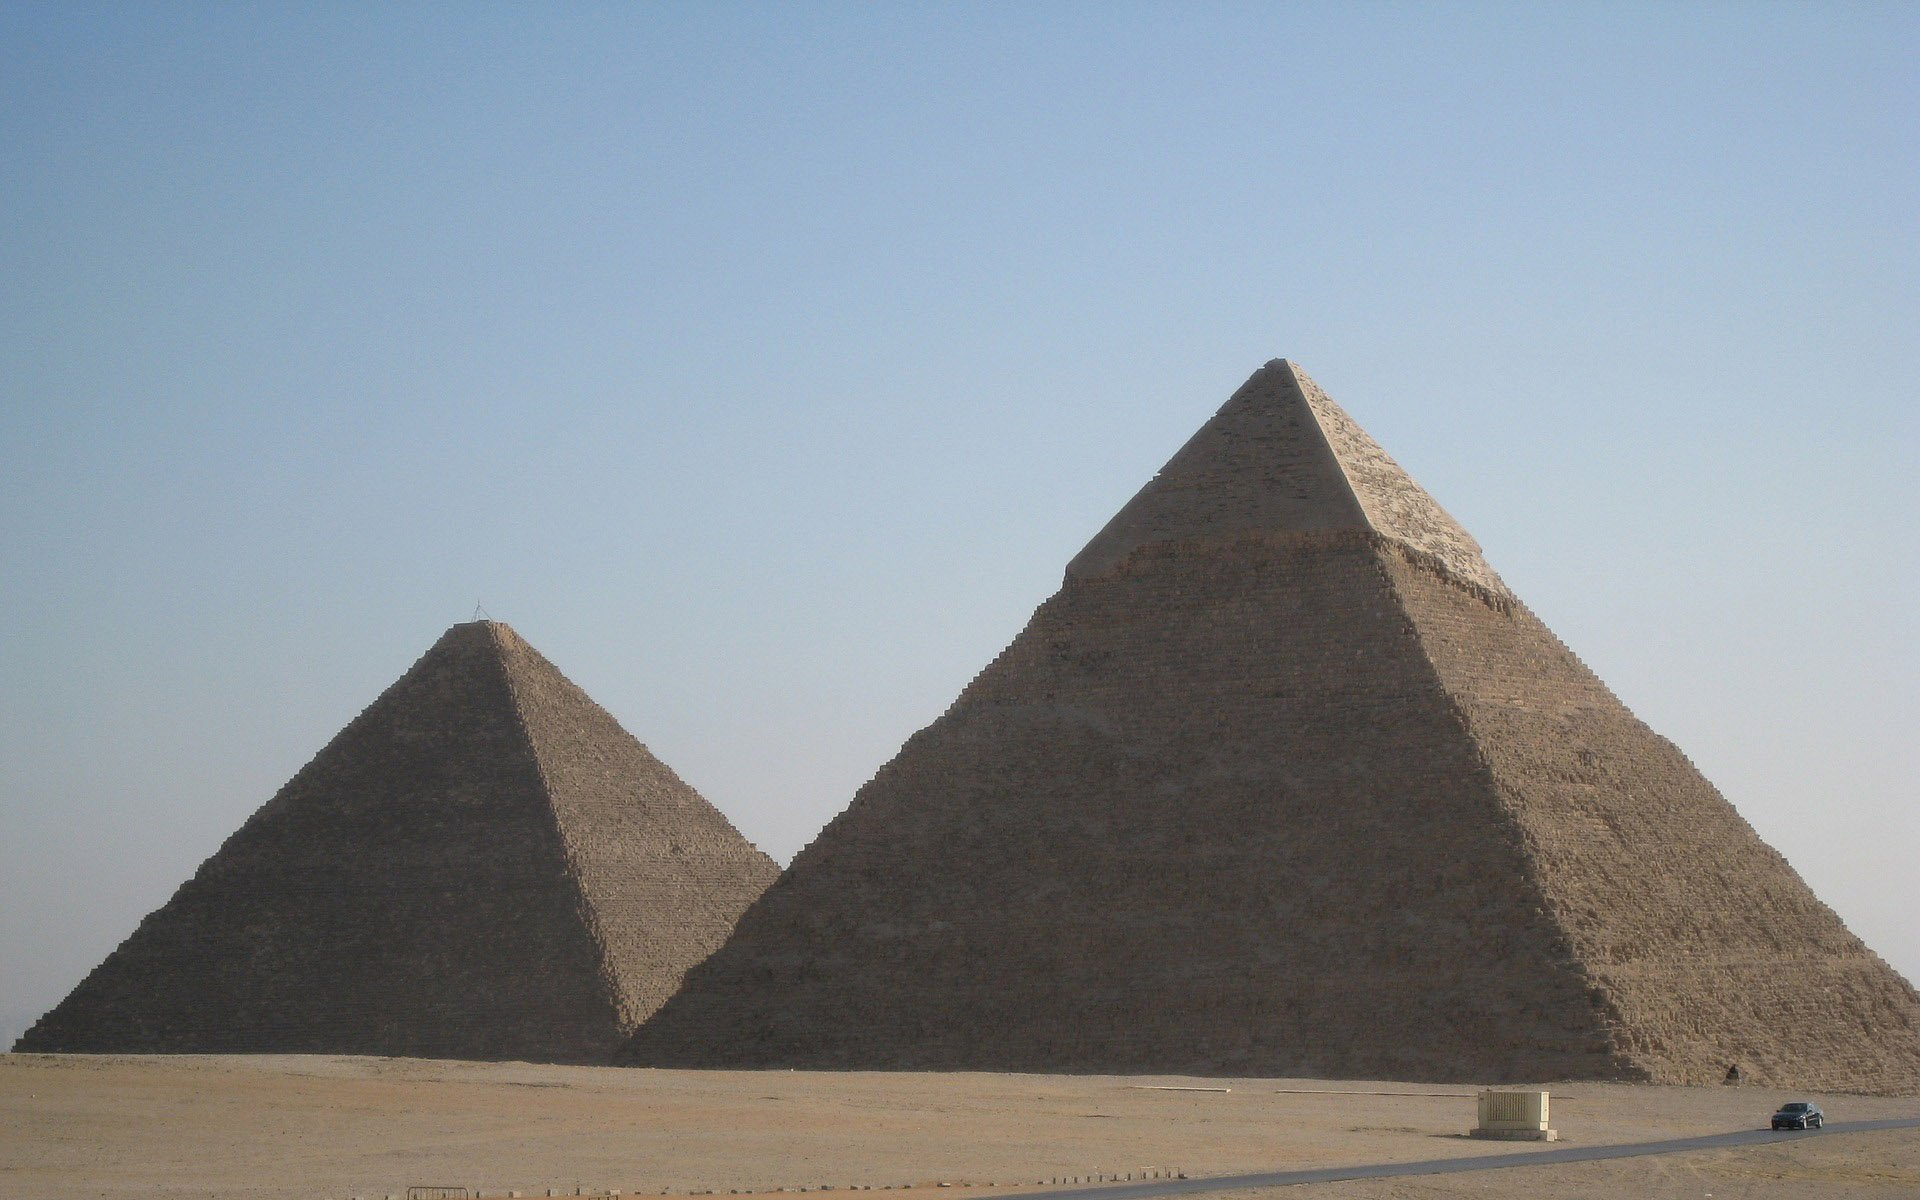 russian pyramid scheme mastermind hawking mavro crypto